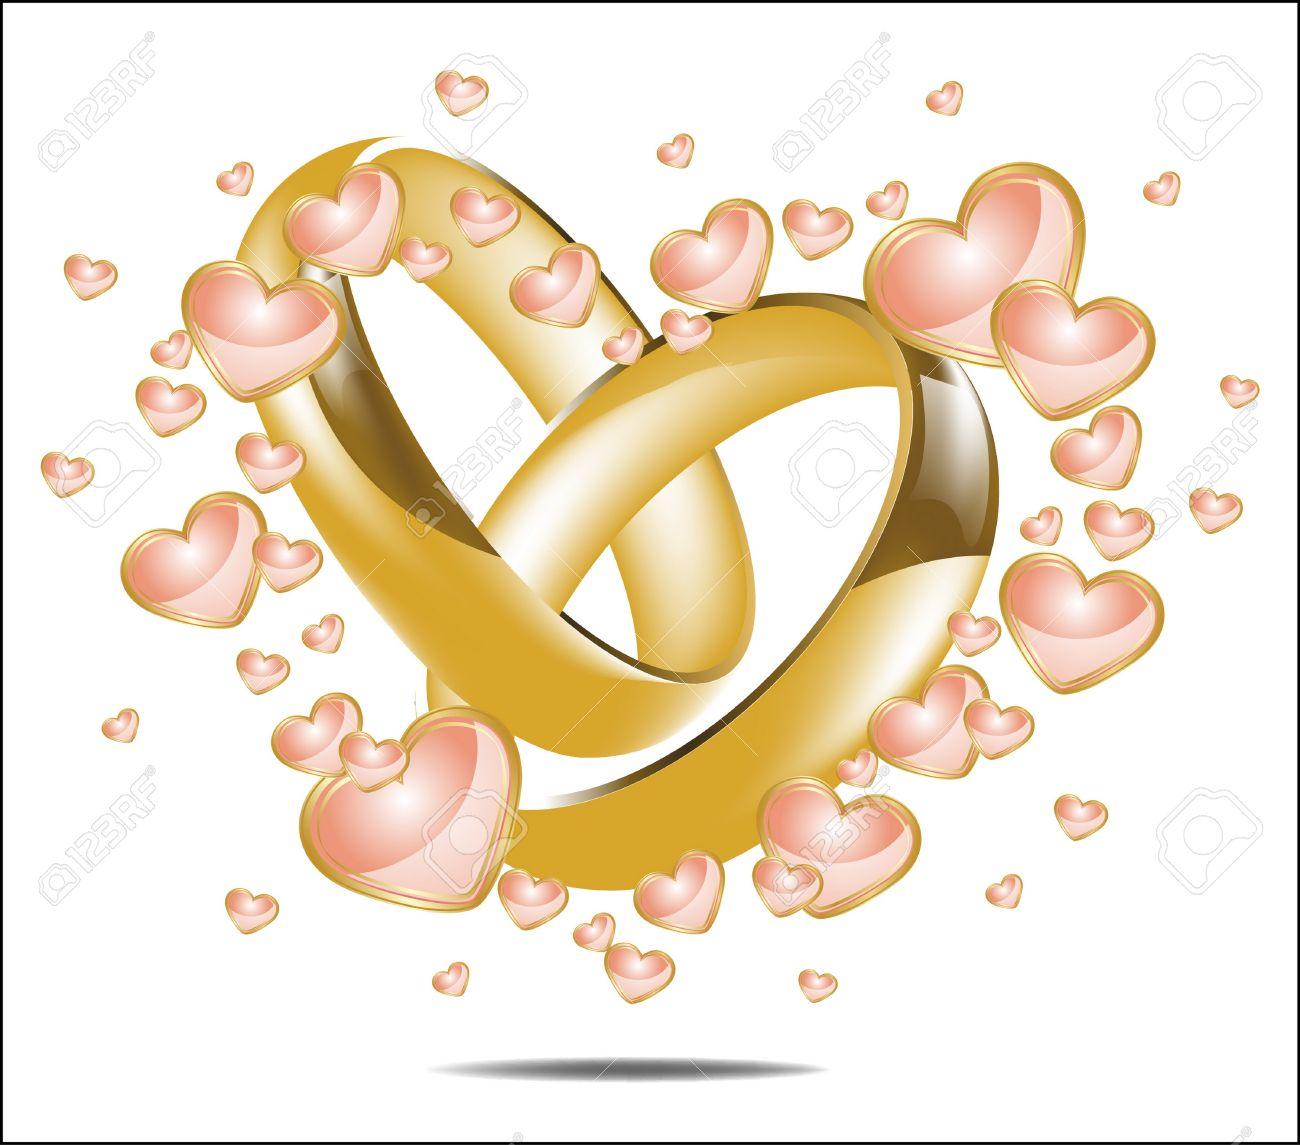 weddinganniversaryrings3 wedding anniversary rings